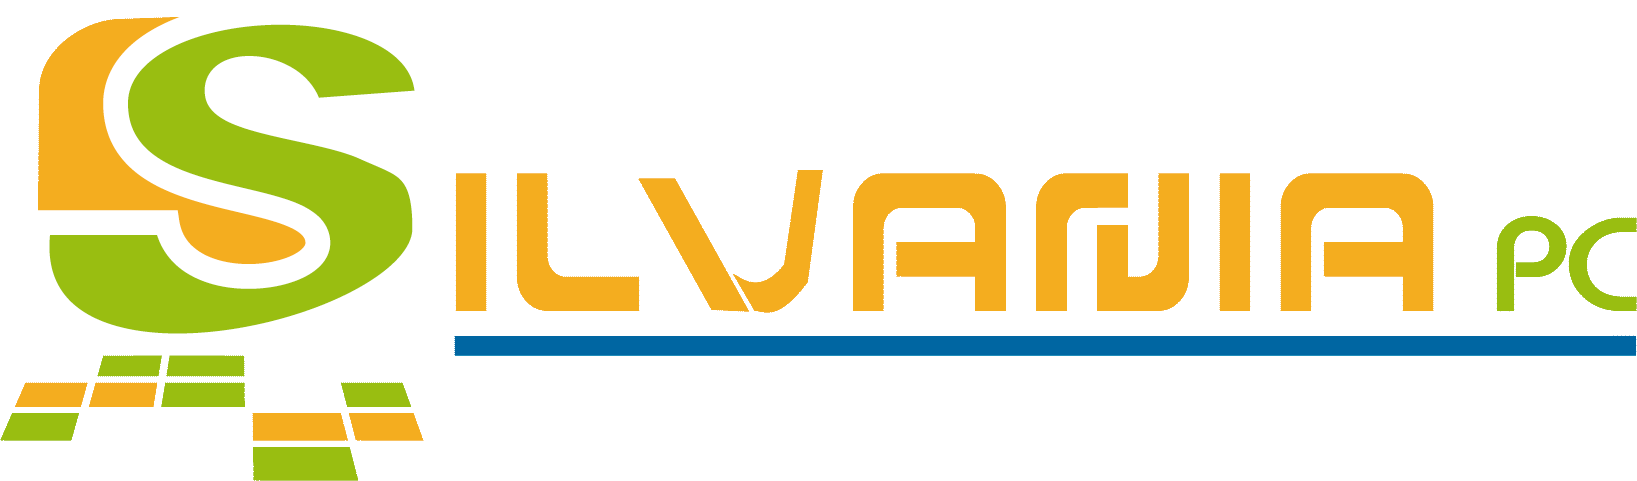 SilvaniaPc